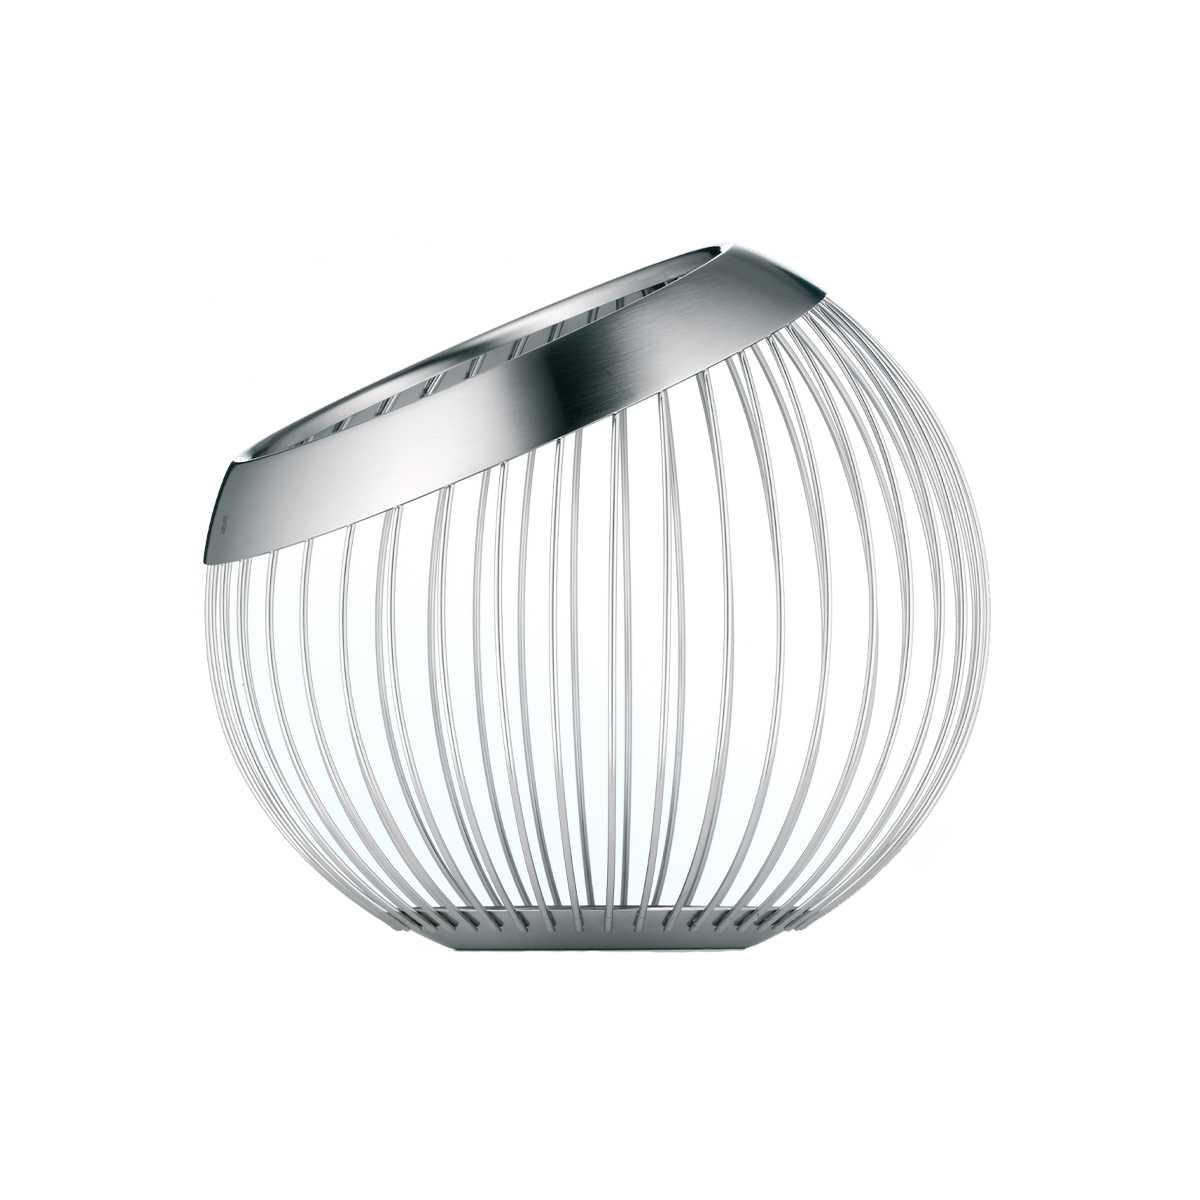 Корзина WMF HOME DECOR, диаметр 13 см, ширина 18,5 см, серебристый WMF 06 6507 6030 фото 2